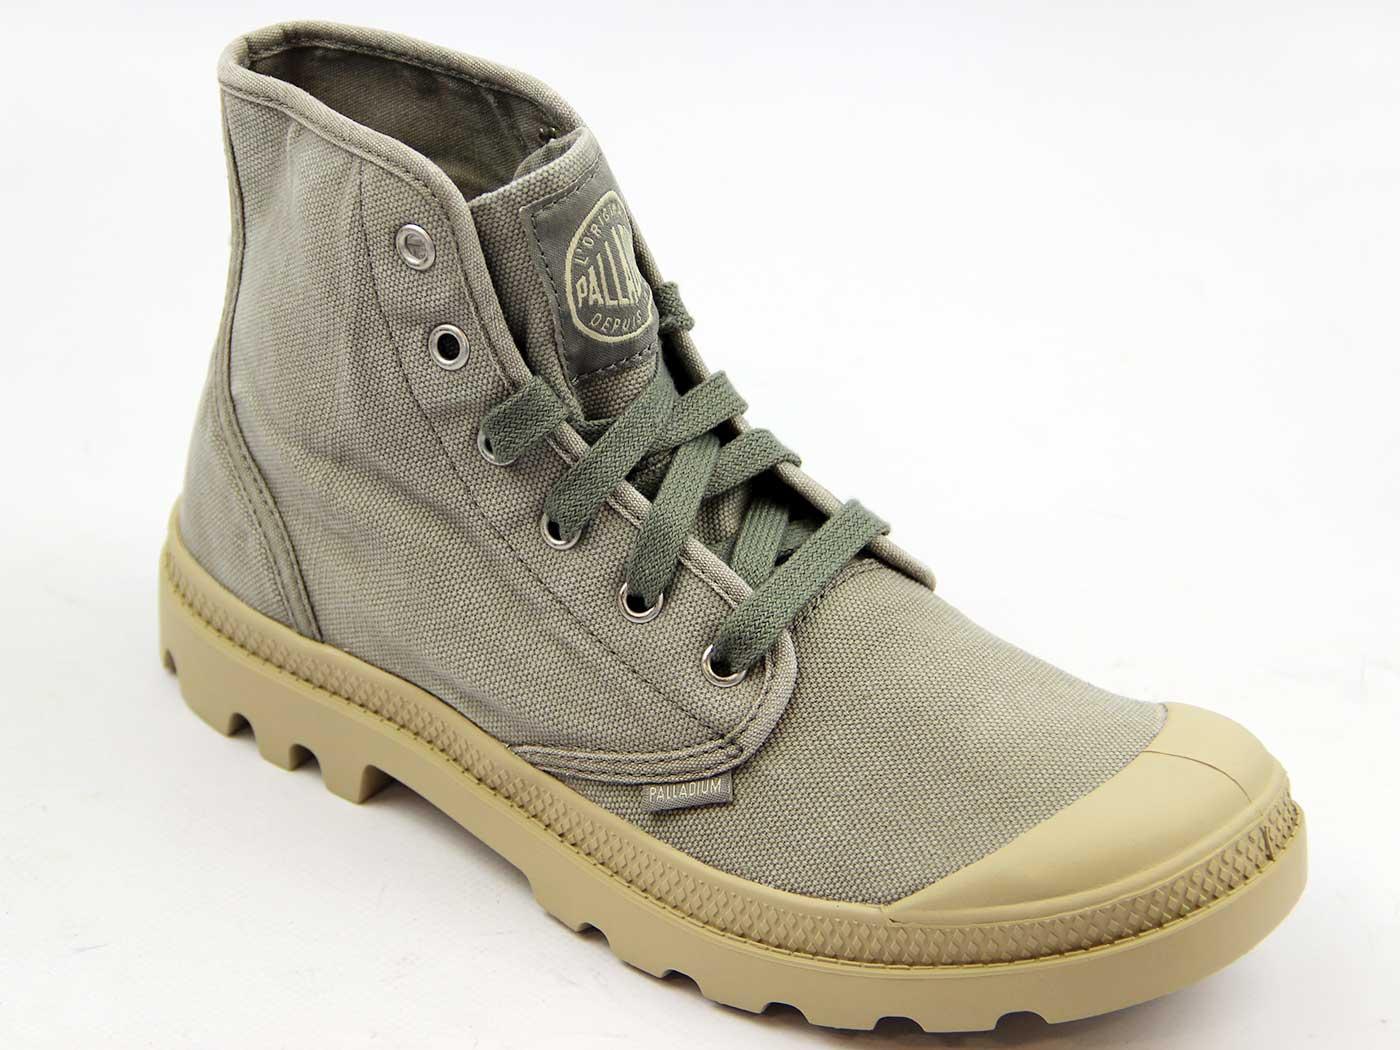 New Grey Palladium Ankle Boots BAGGY D Viewshop_detailaanzicht_2